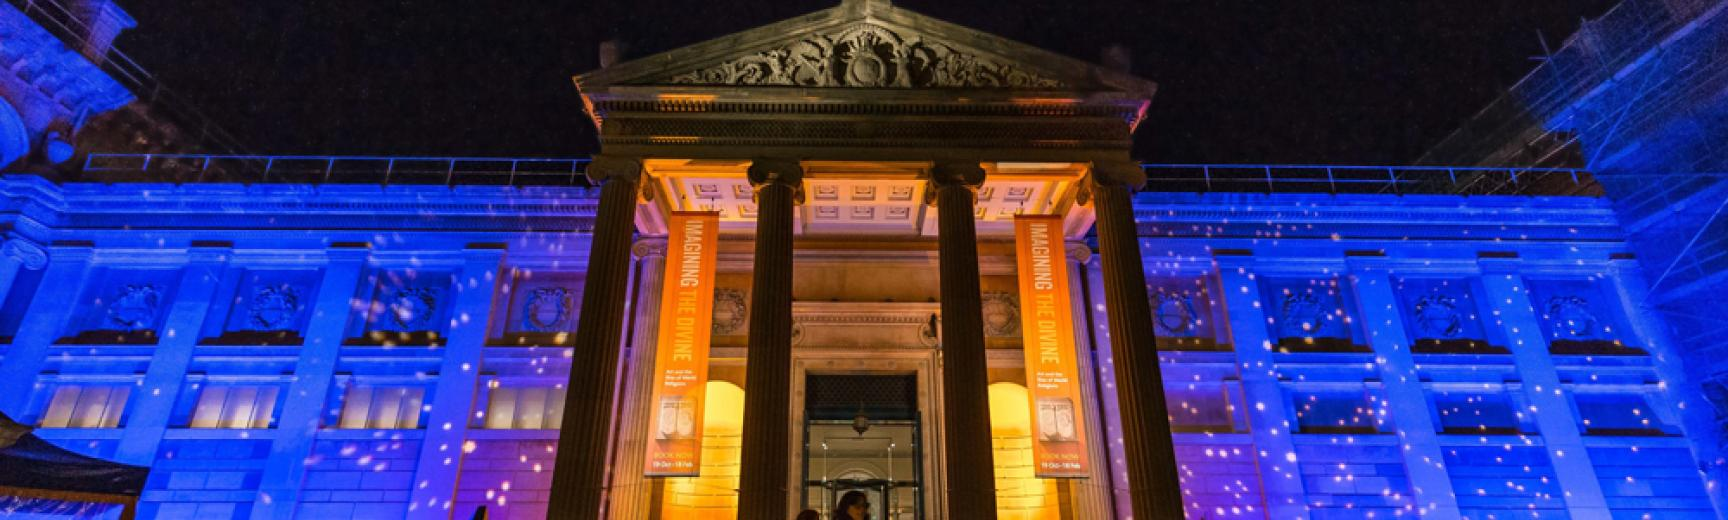 Ashmolean Museum at Night